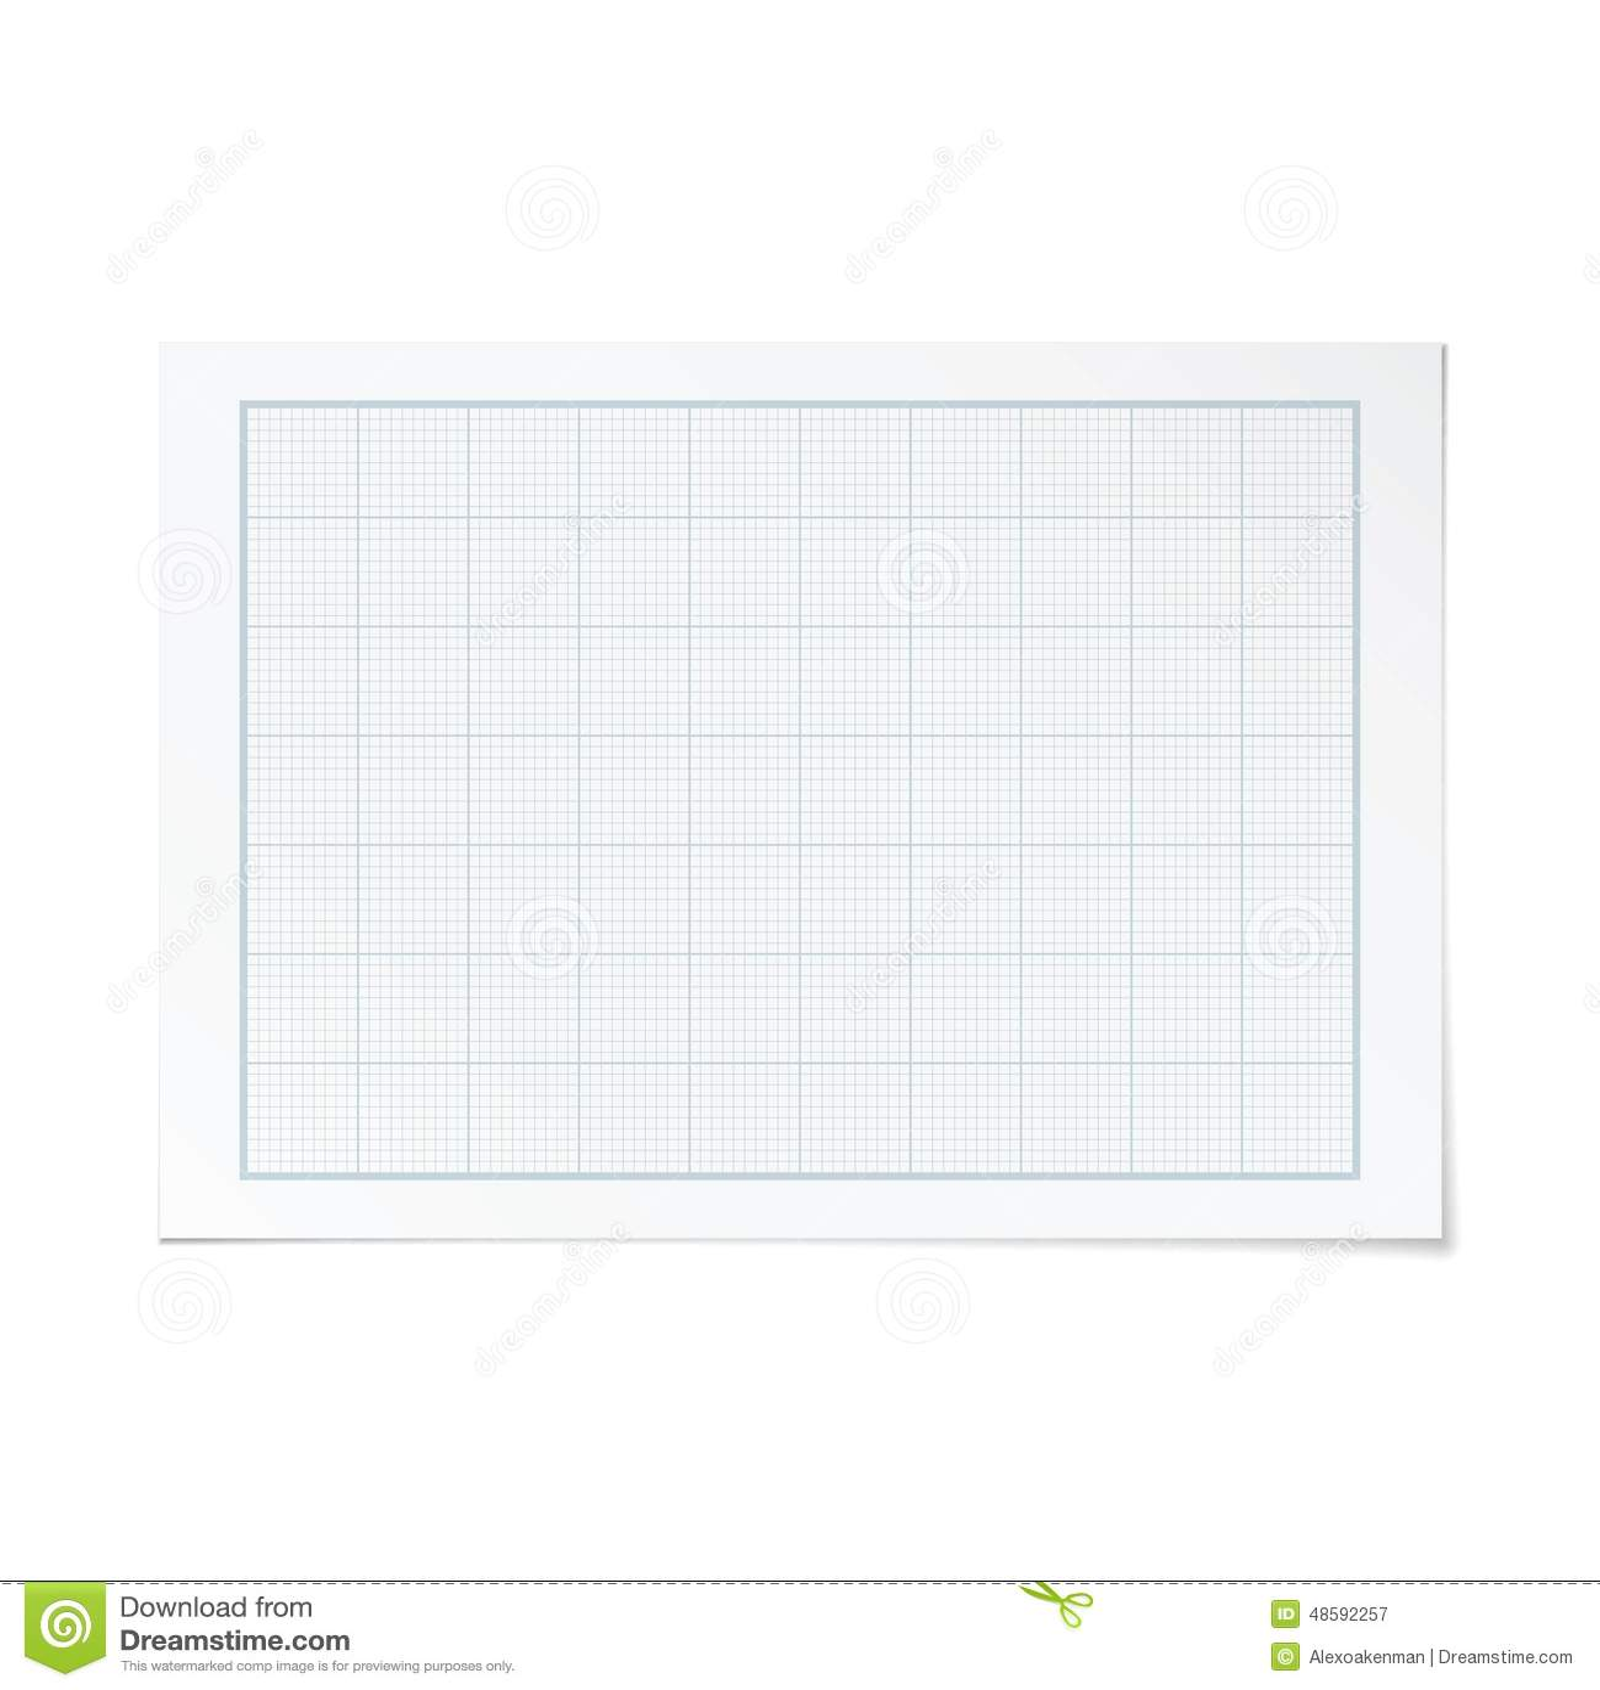 vector landscape orientation engineering graph paper stock vector